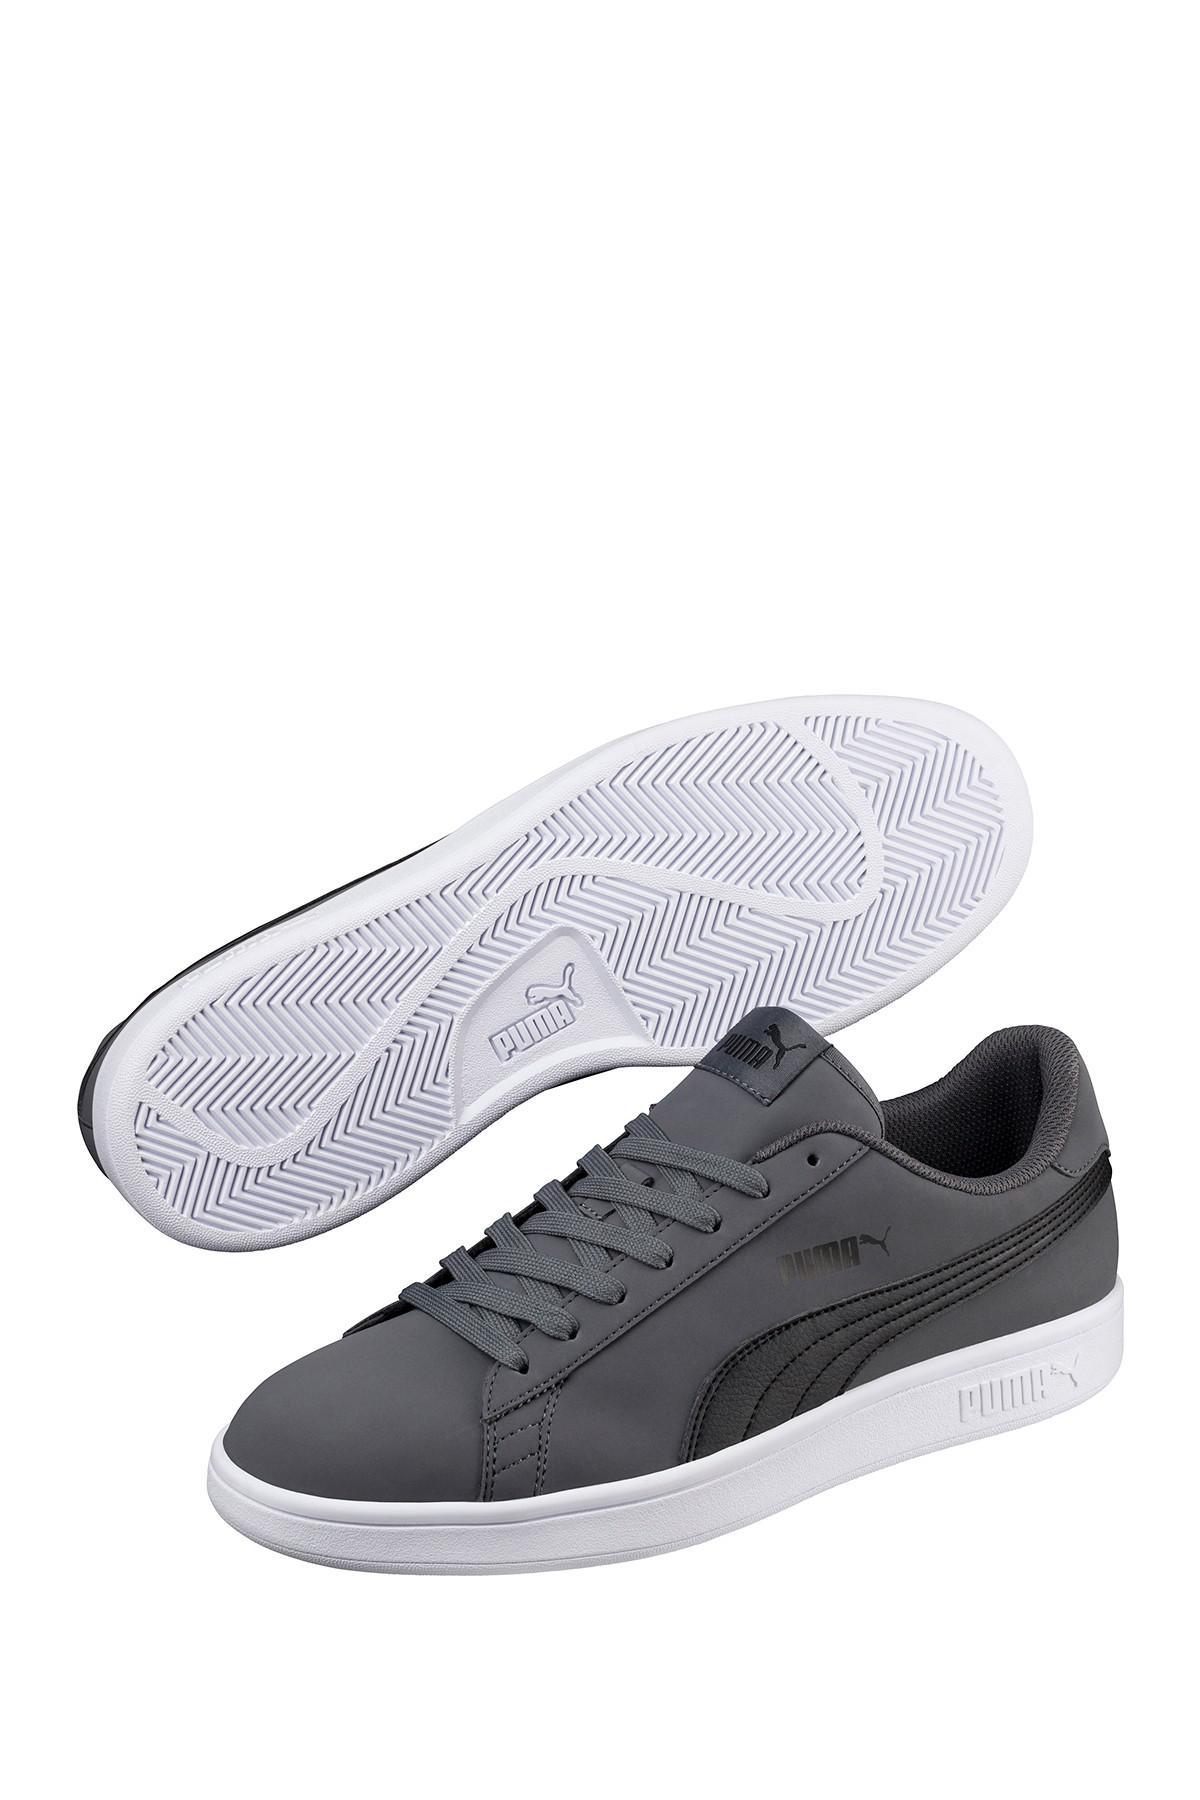 Lyst - Puma Smash V2 Buck Sneaker in Gray for Men c5b22354a